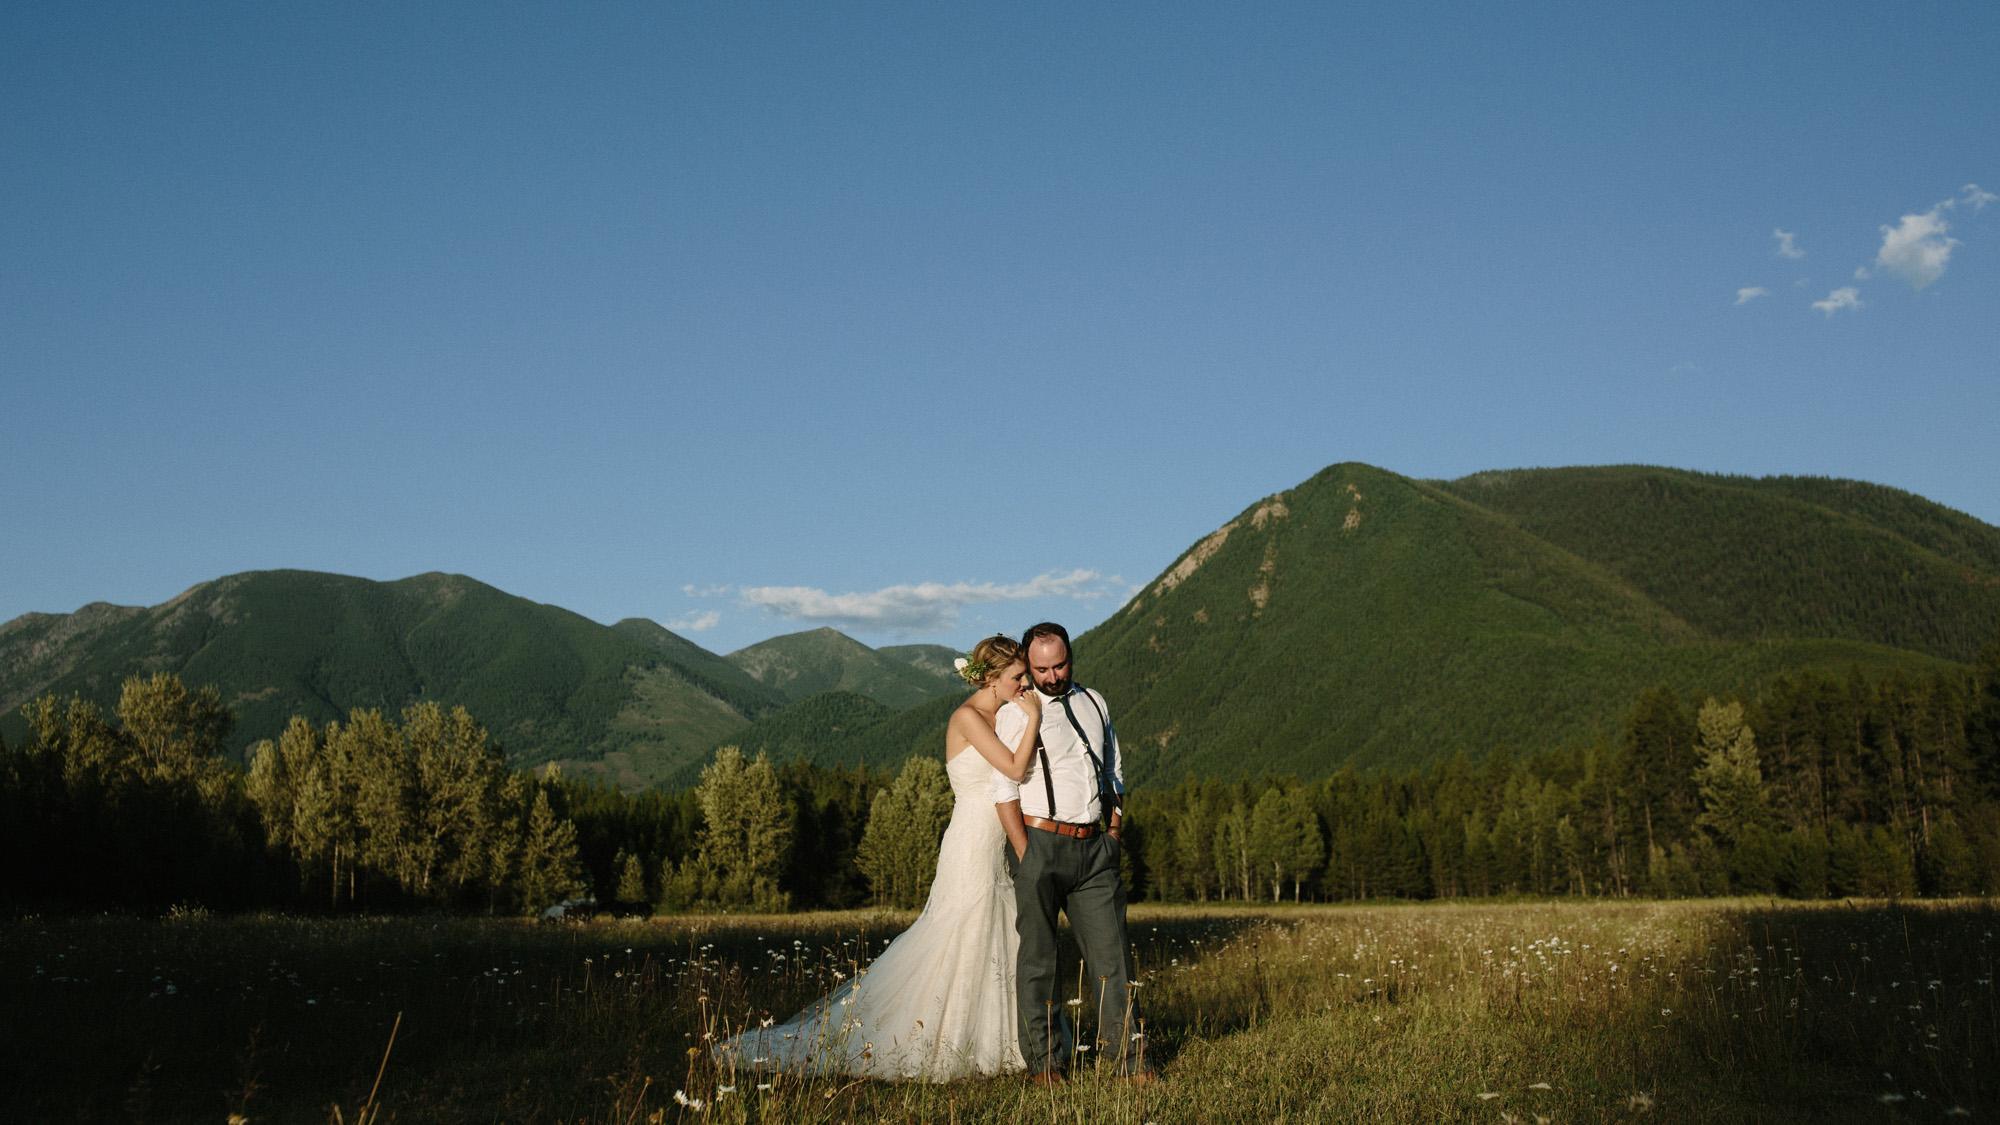 Montana_Wedding_Photos_alec_vanderboom-0126.jpg